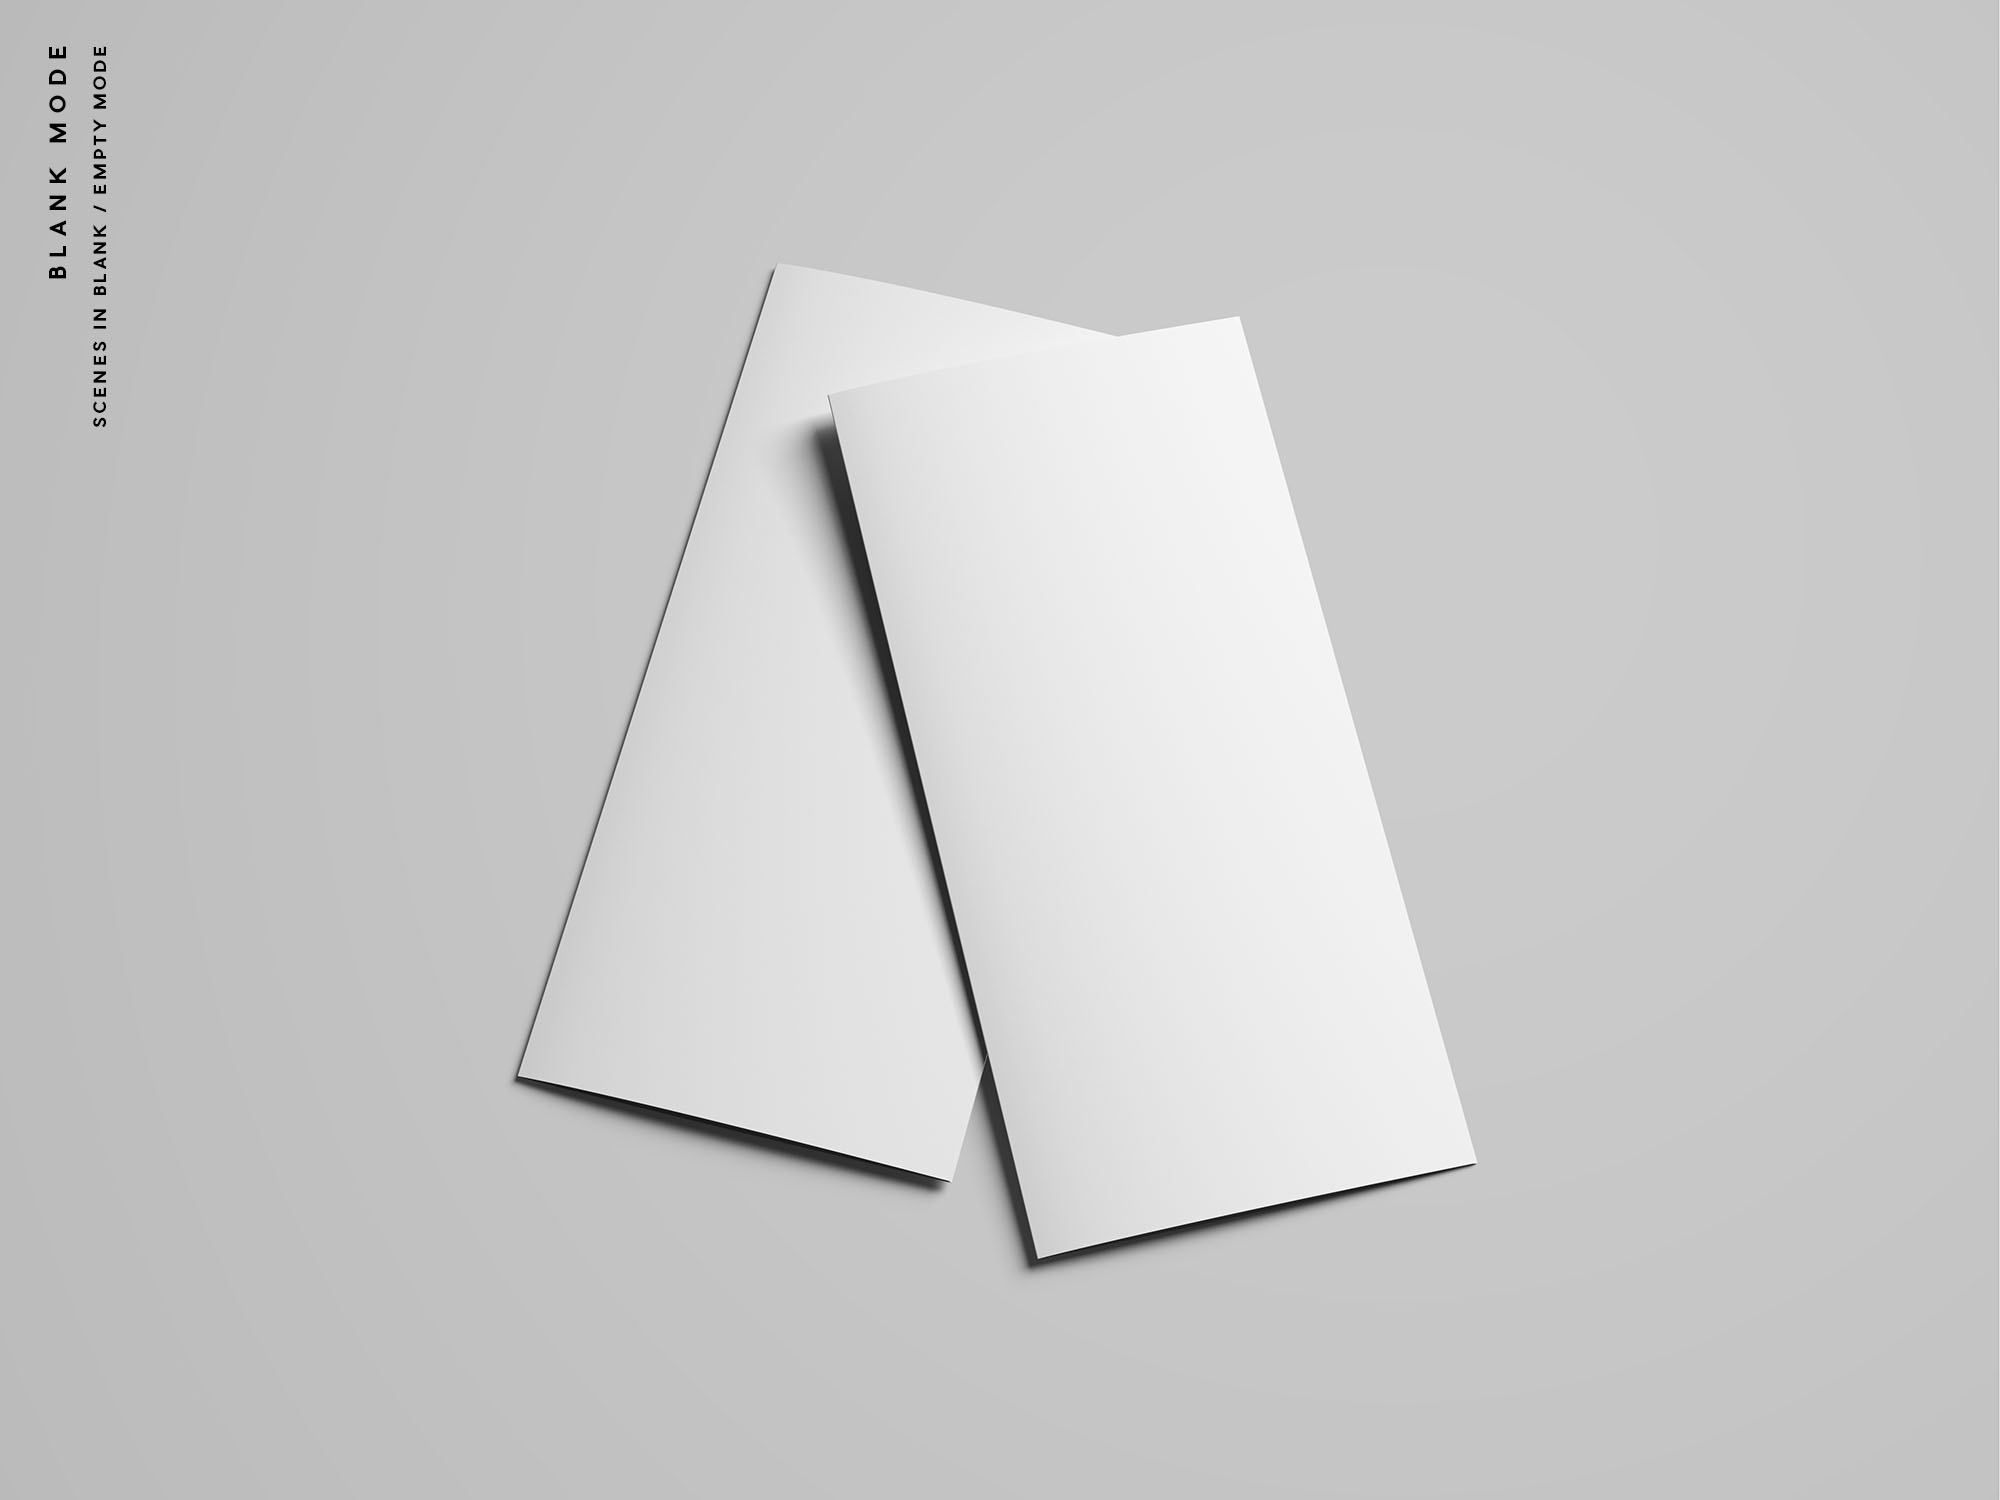 Trifold Brochure Mockup - Blank Mode